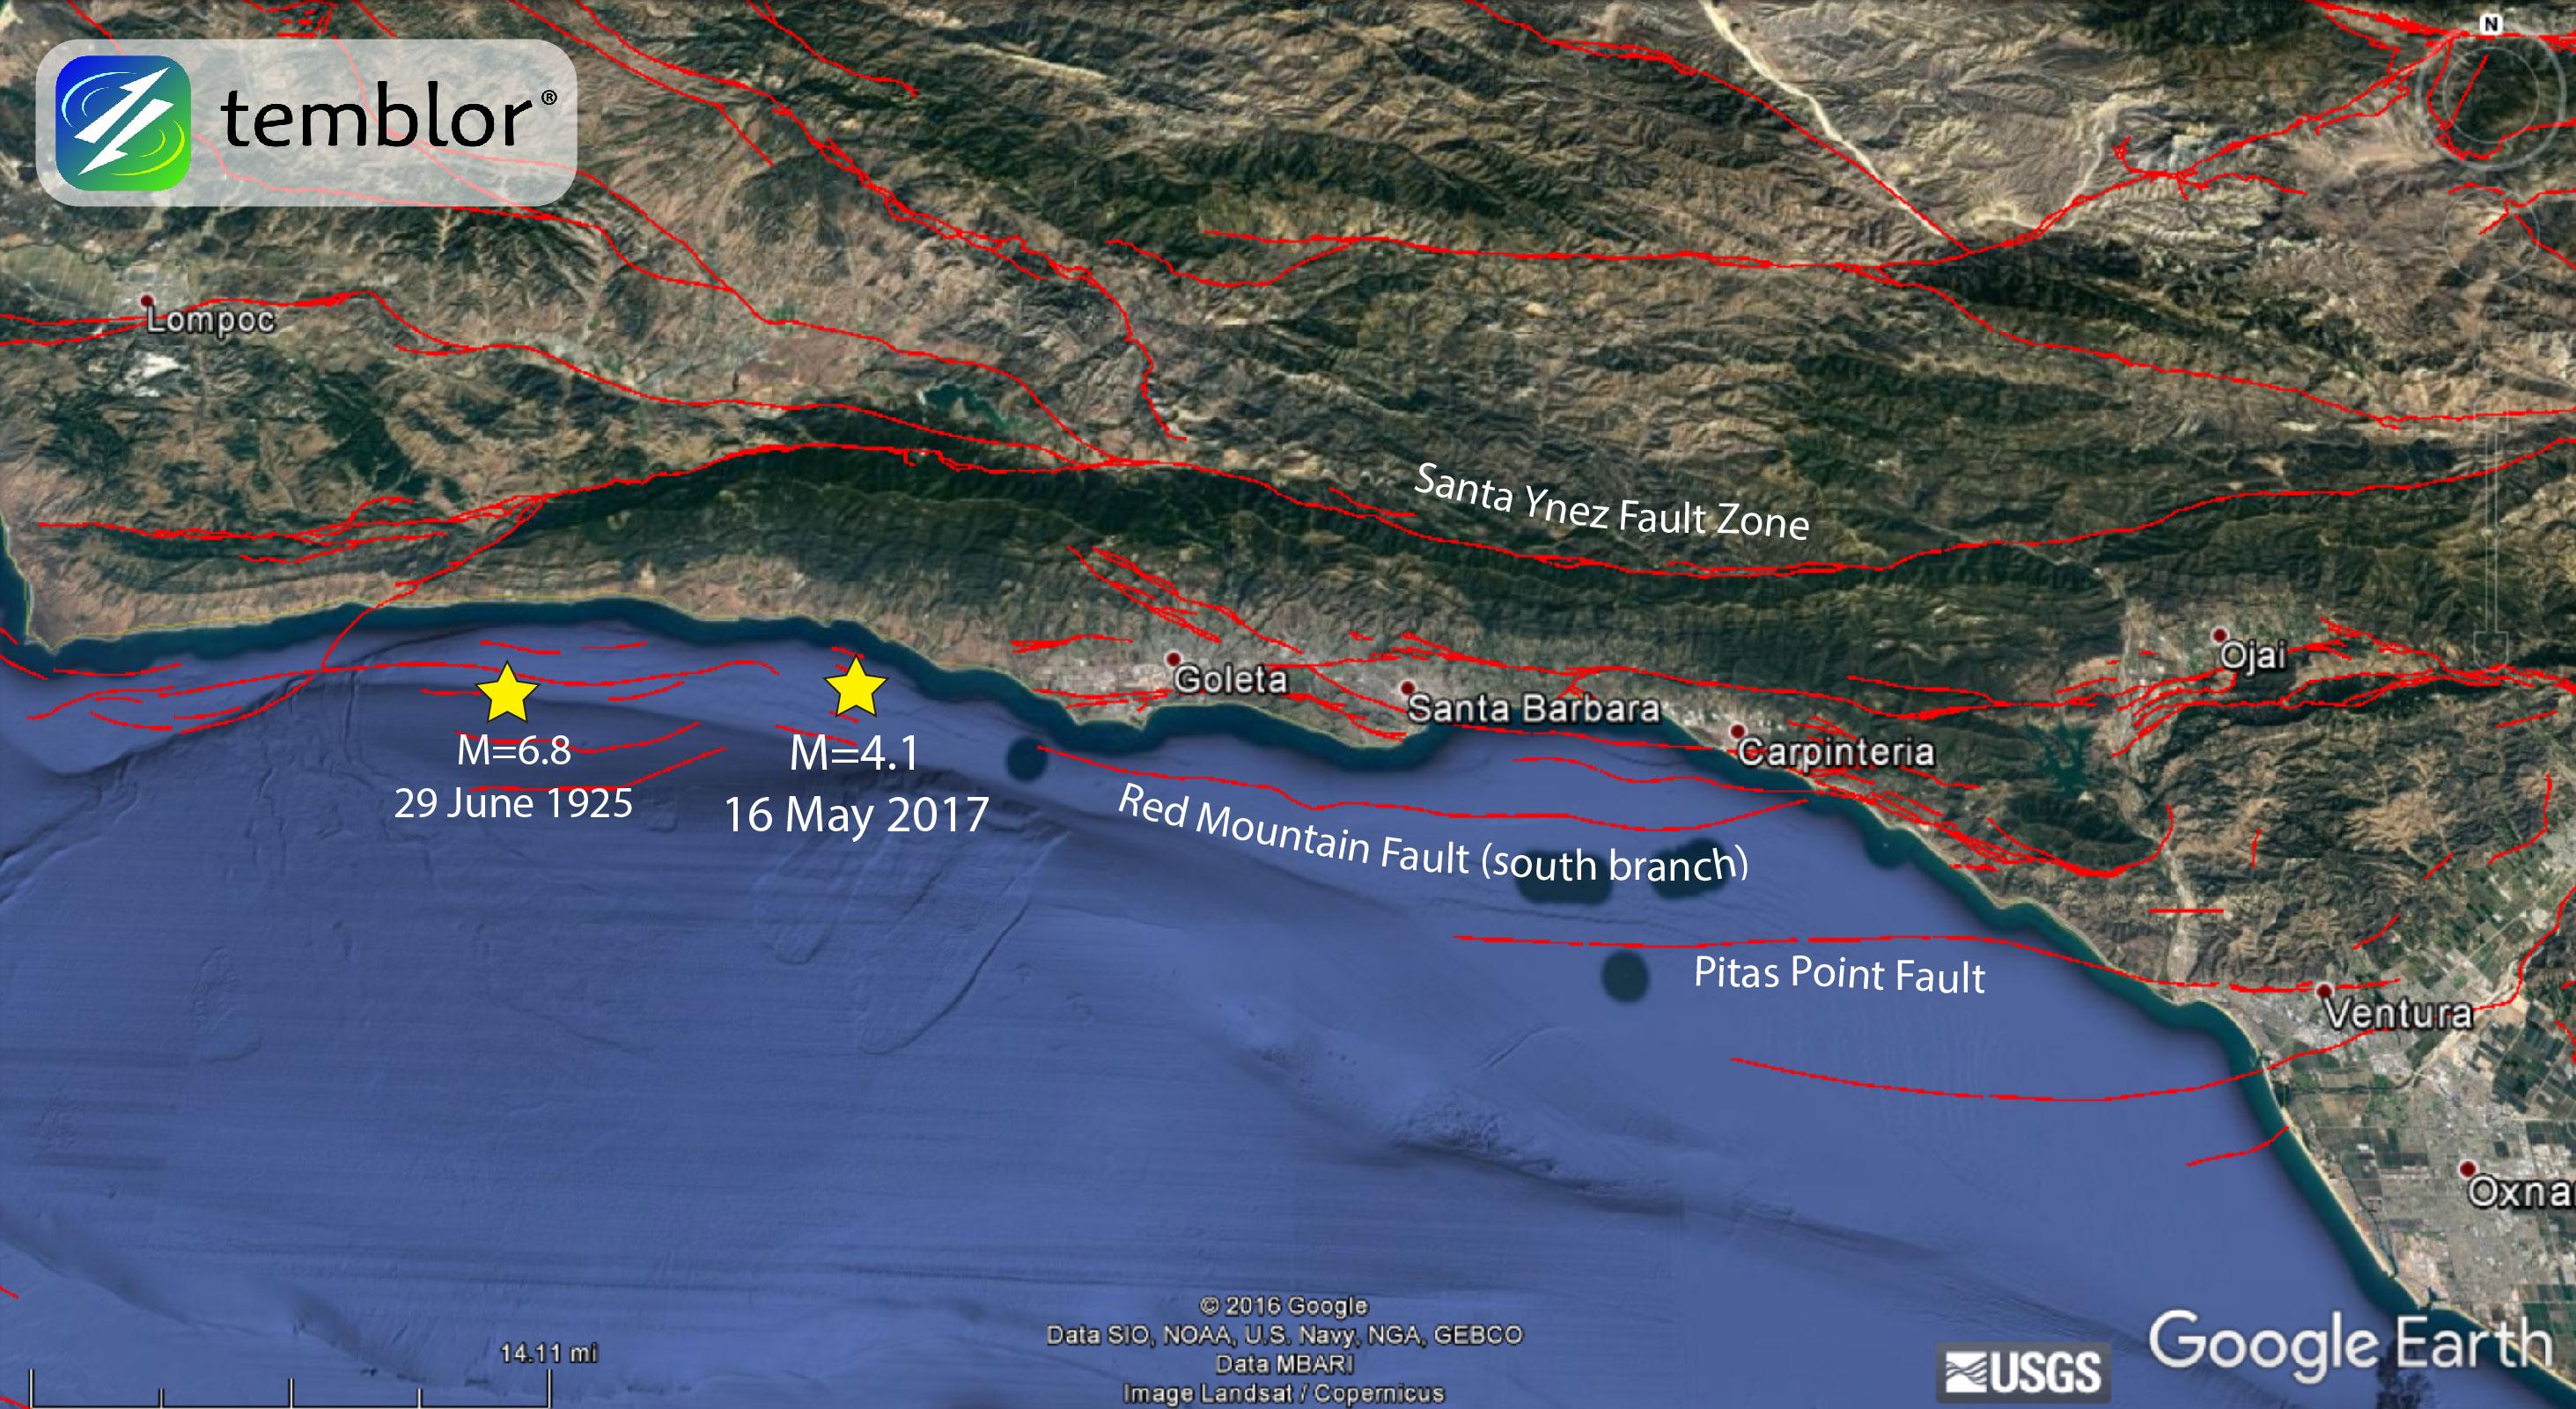 Debunked Leaked US Navy Map New Madrid Submerged US Metabunk Map - Washington dc earthquake map